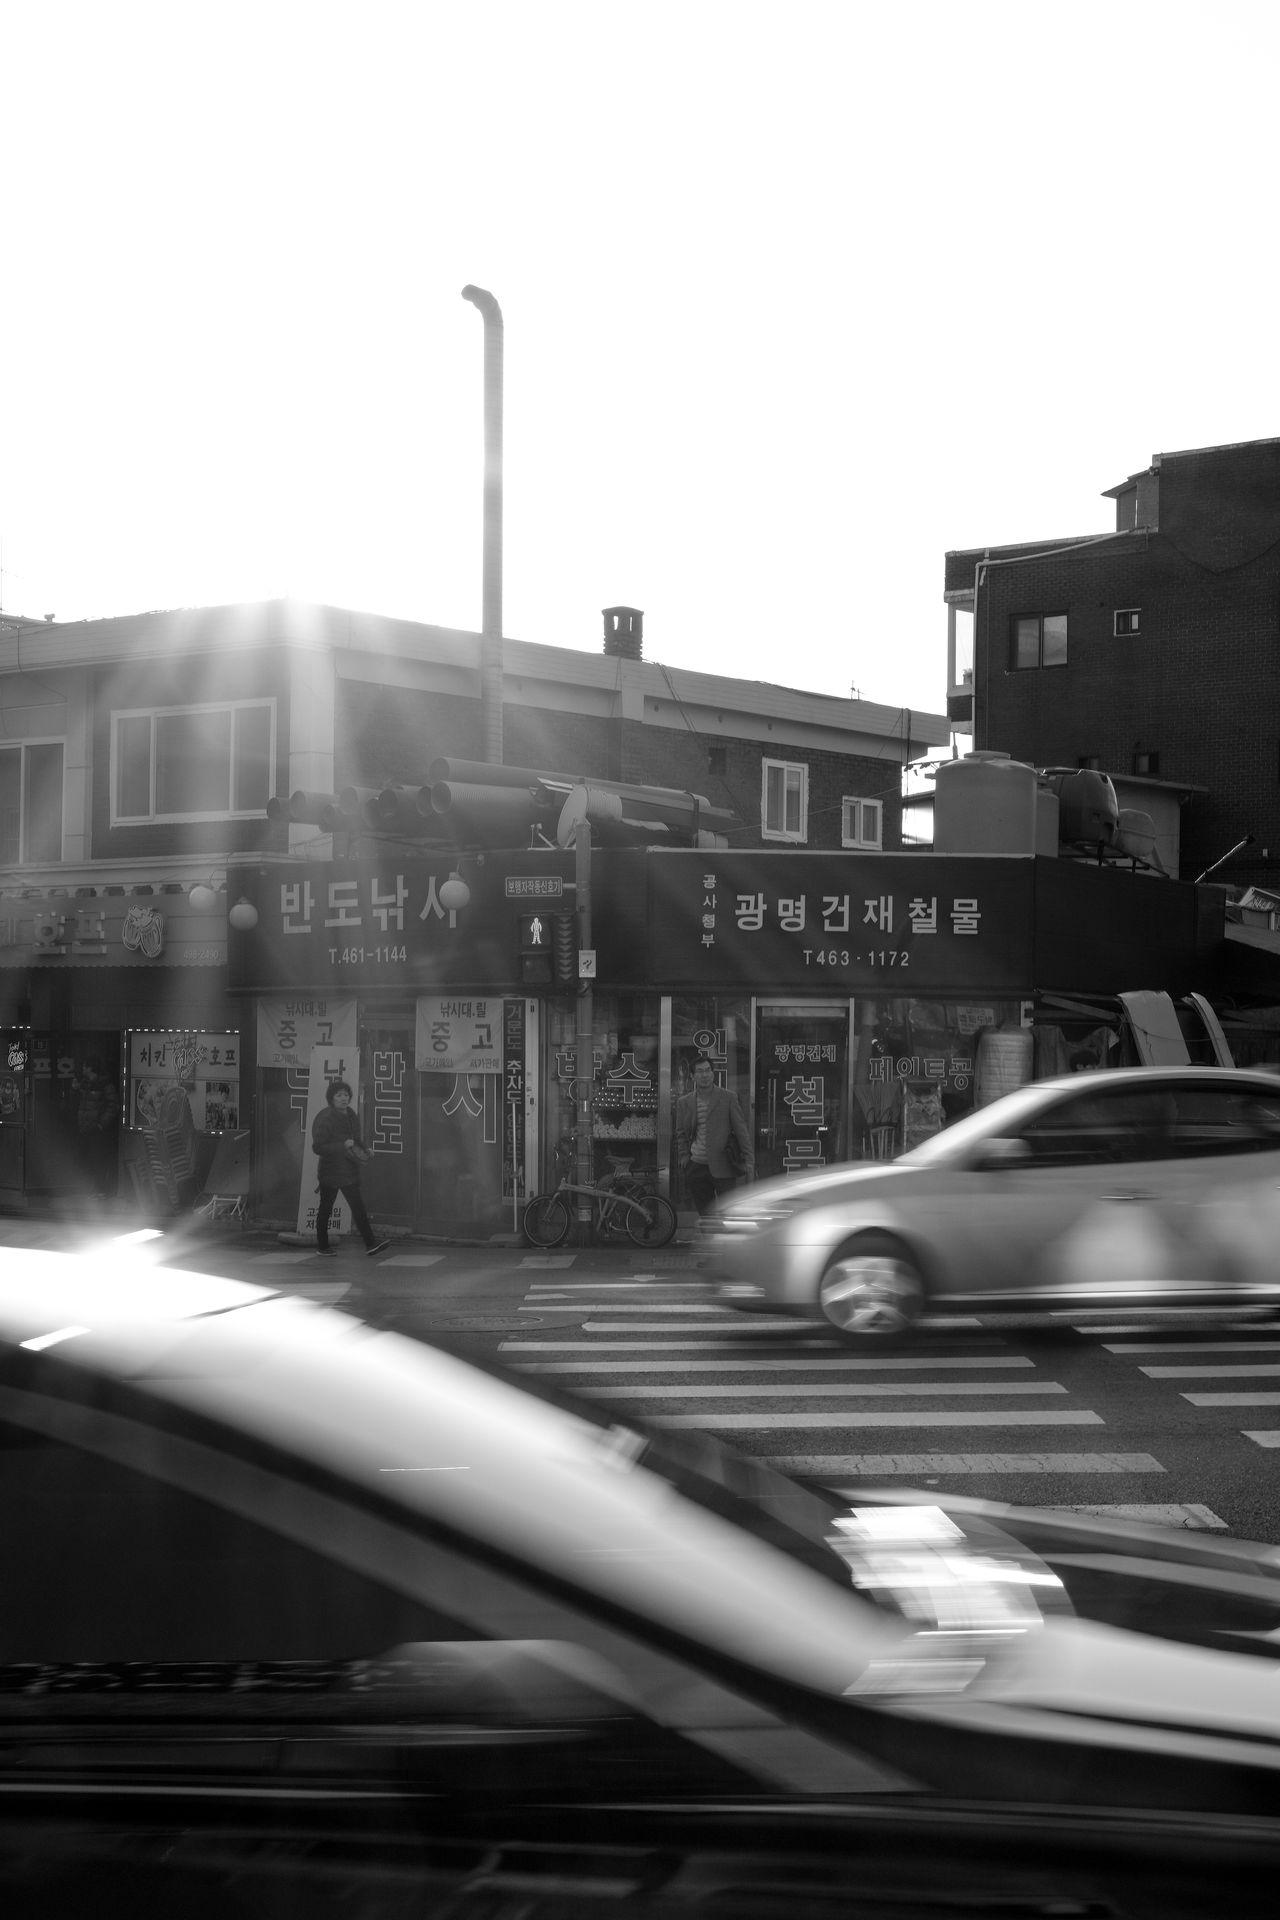 Blackandwhite Building Car Cityscape Close-up Day Hardware Store Local Neighborhood Outdoors Seoul Street Streetphotography Sunlight Sunset Traffic Lights Transportation Vehicle First Eyeem Photo